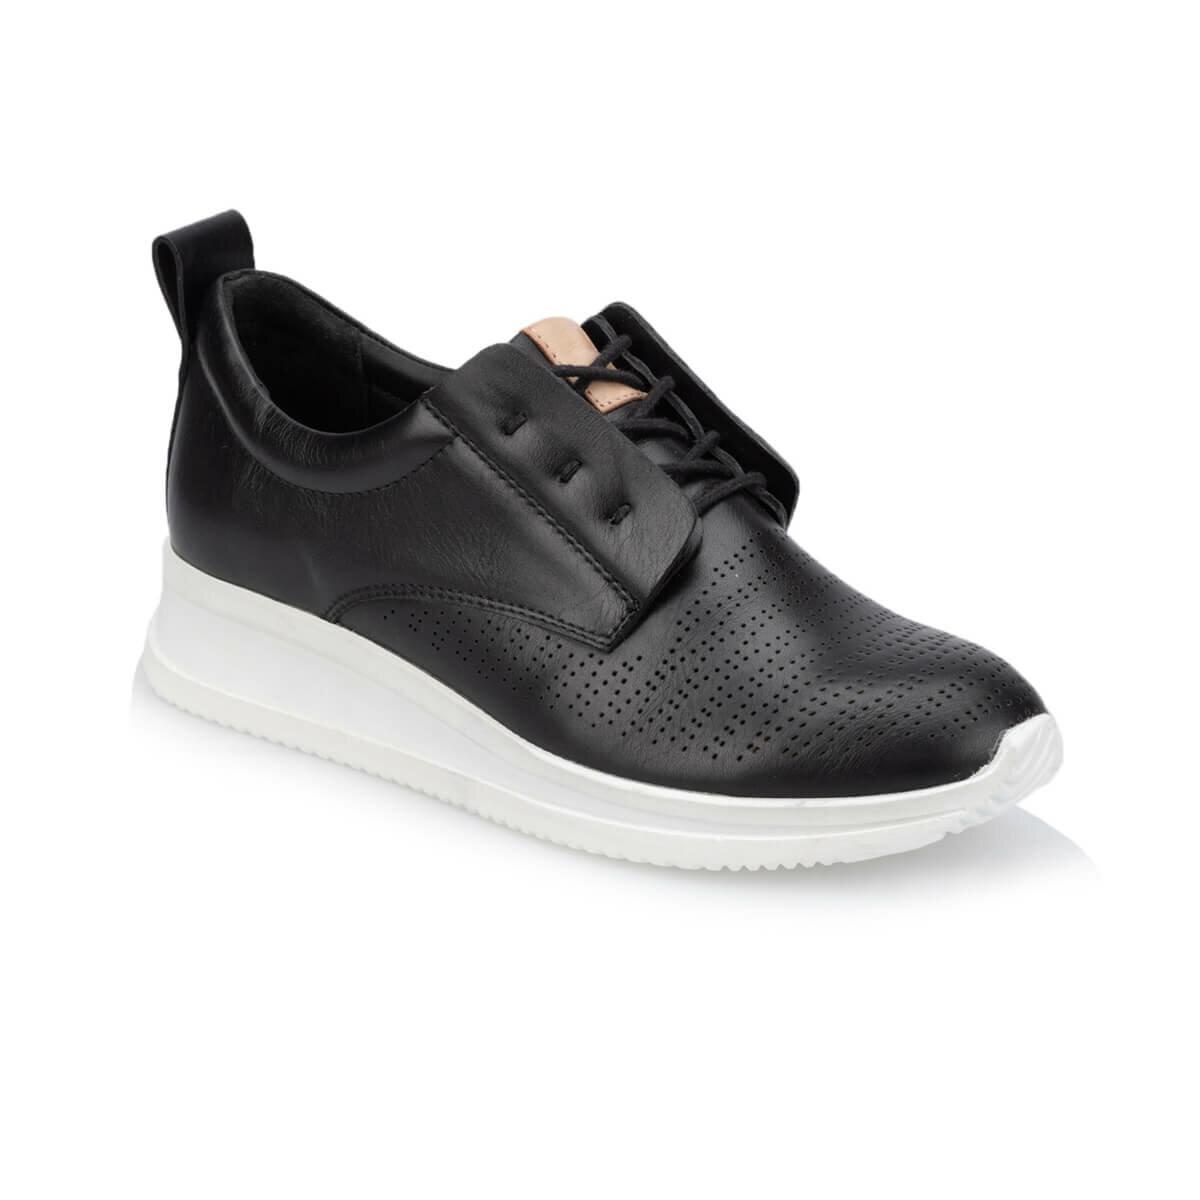 FLO TRV910008 Black Women Shoes Polaris